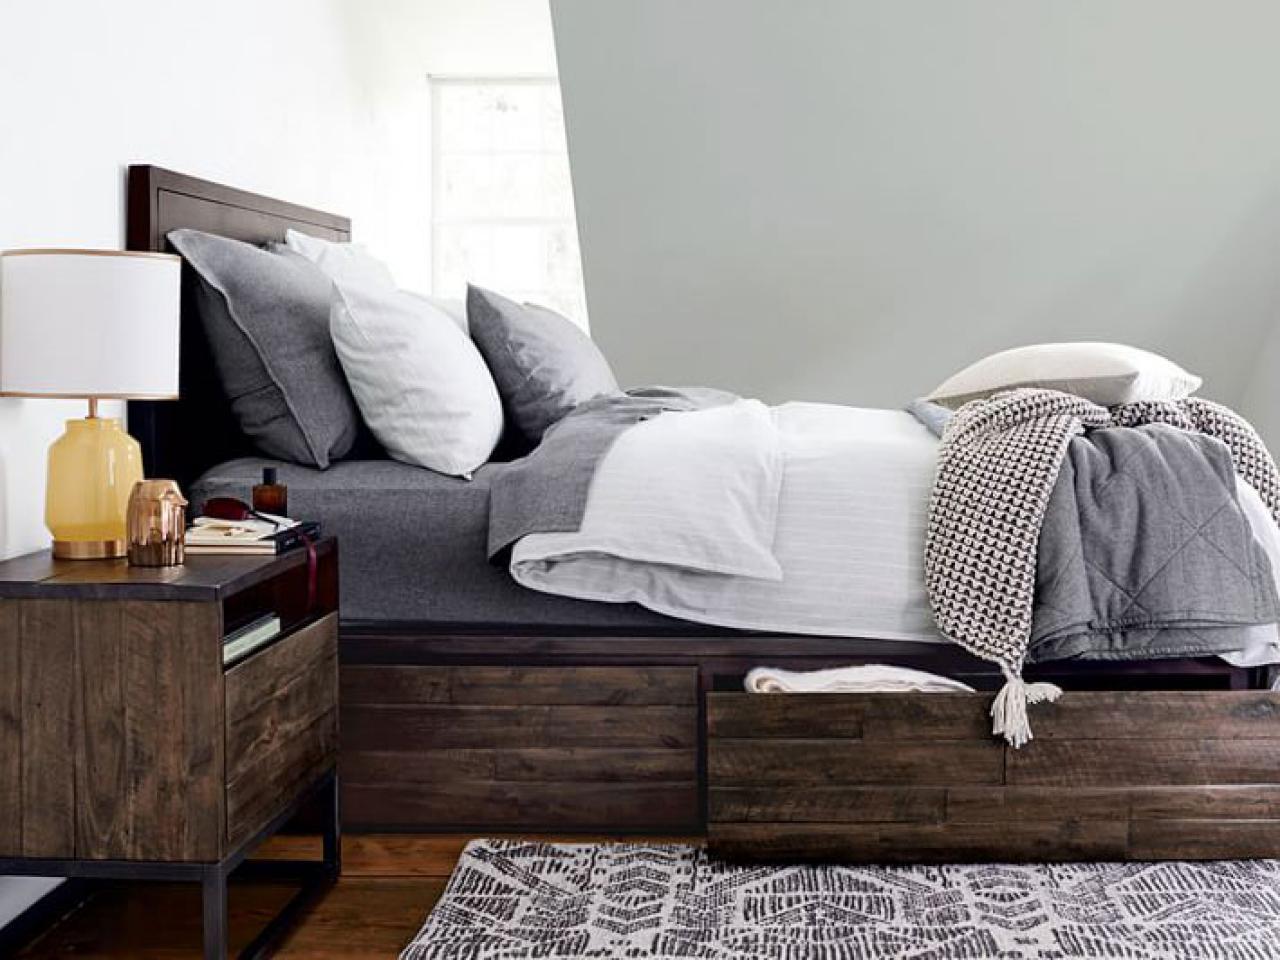 Best Storage Beds For Your Home Hgtv S Decorating Amp Design Blog Hgtv